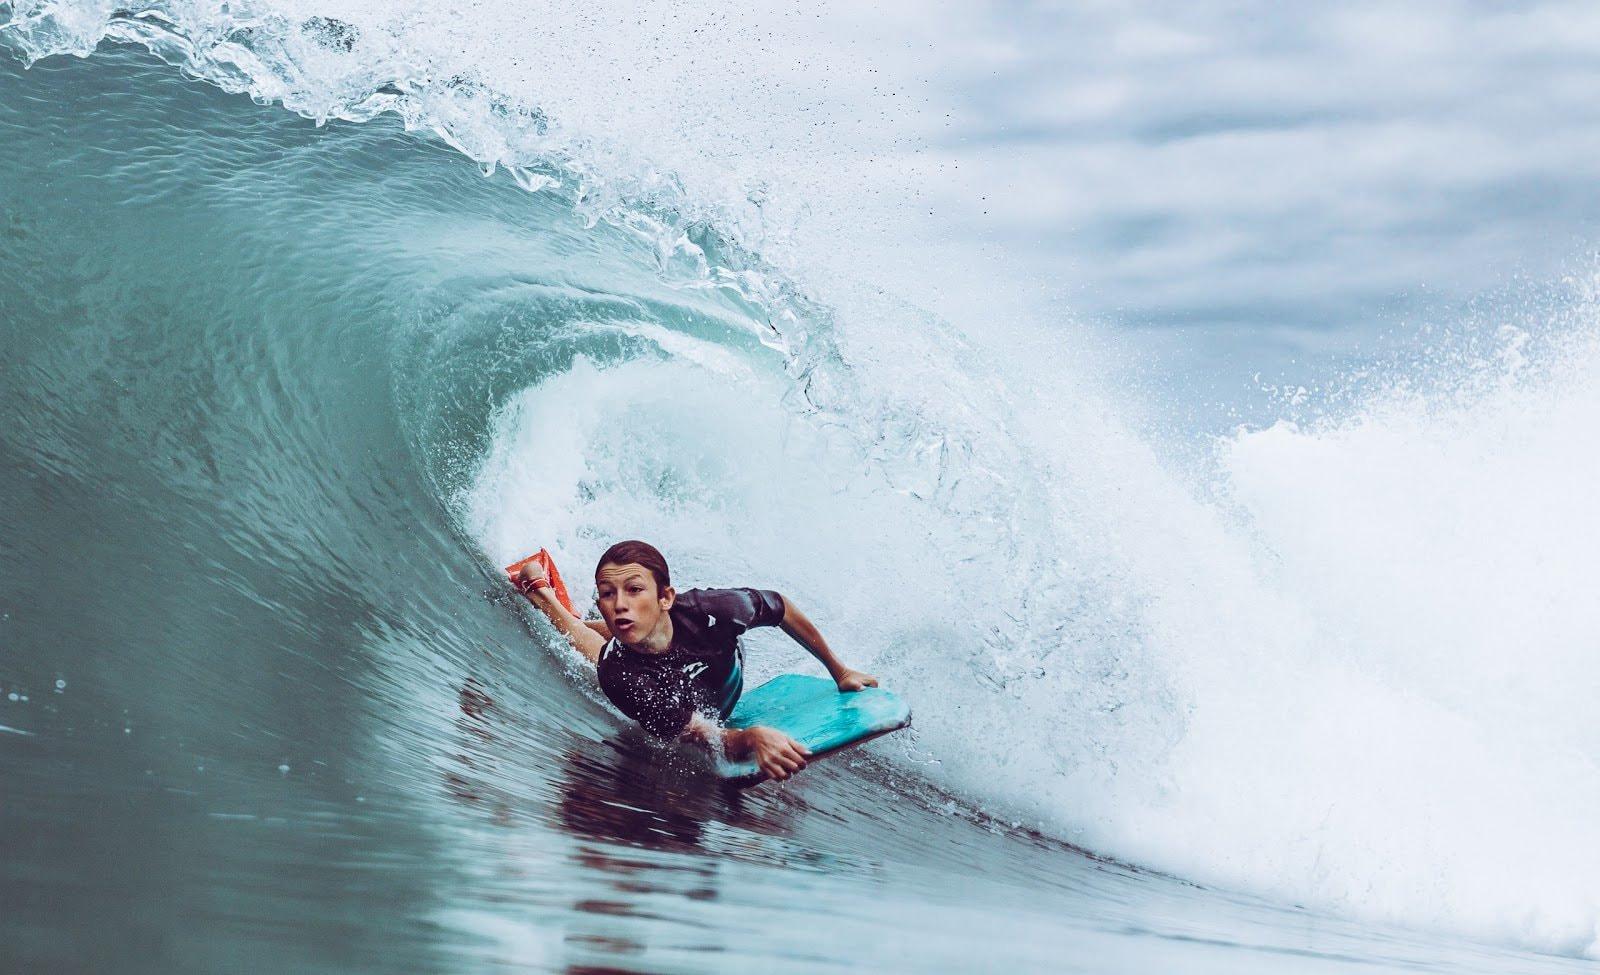 Surfer action shot by Feliper Silva